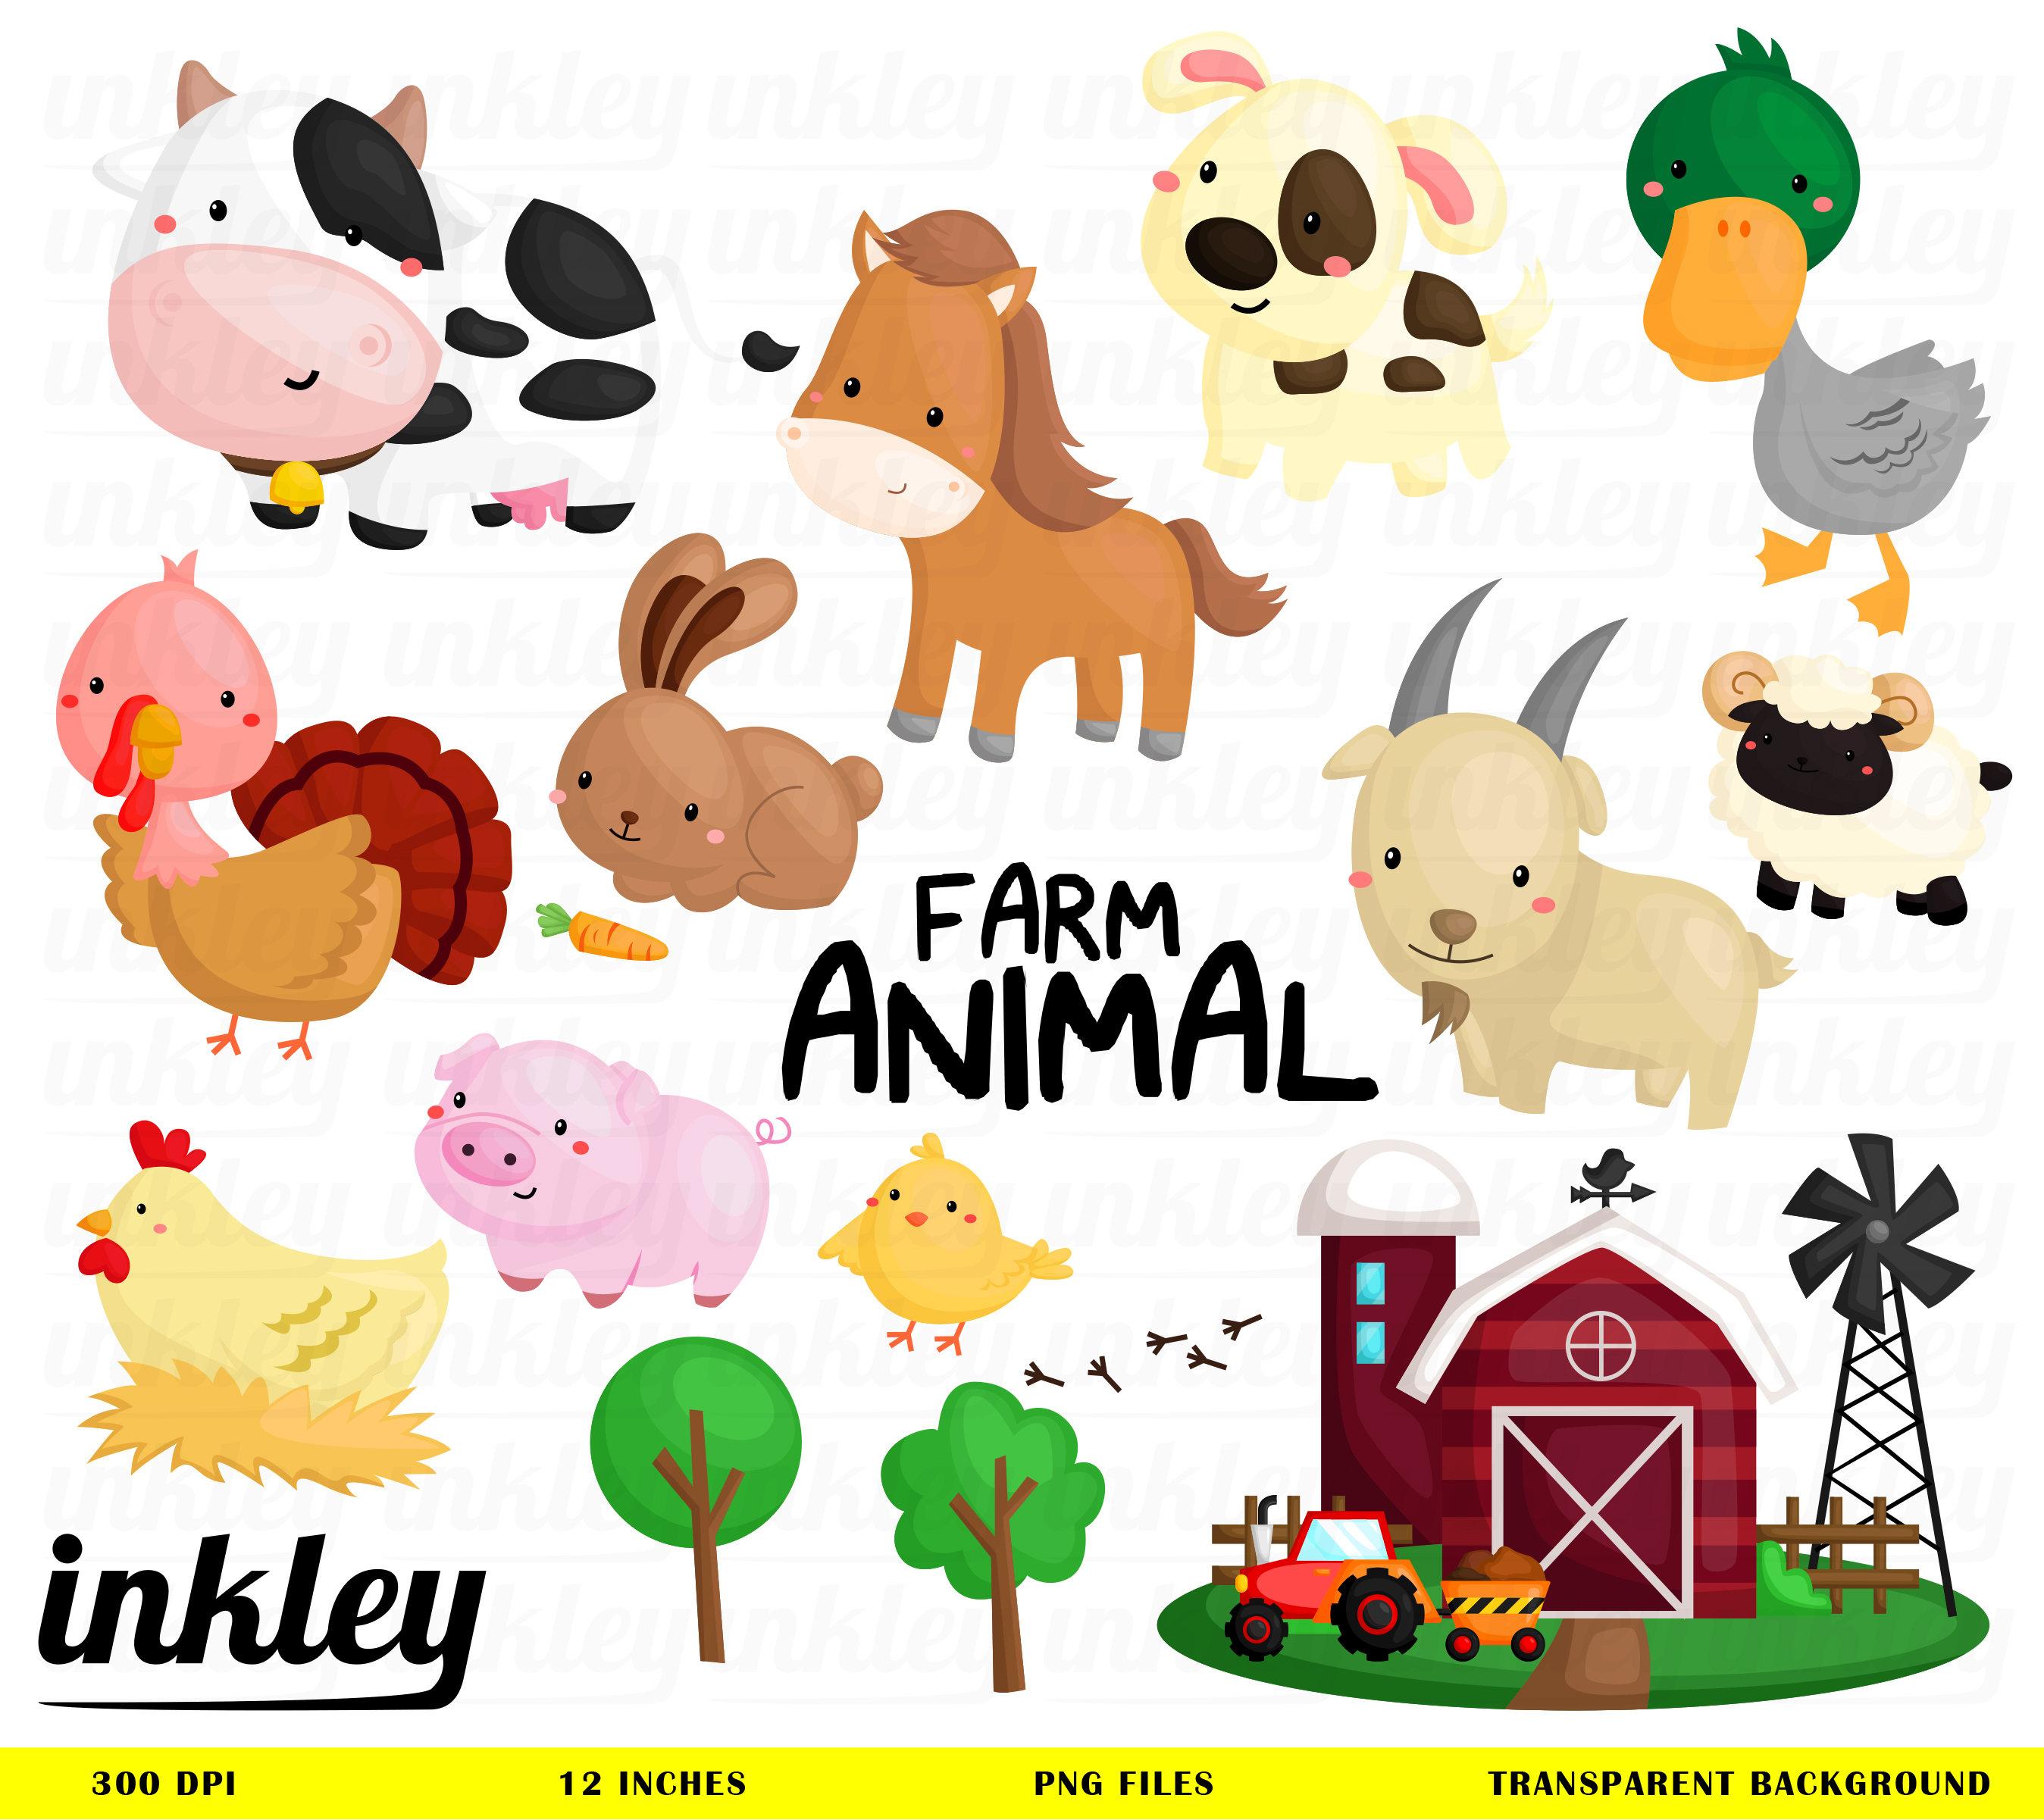 farm animal clipart farm animal clip art farm animal png rh etsy com farm animal clipart for teachers farm animals clip art pictures